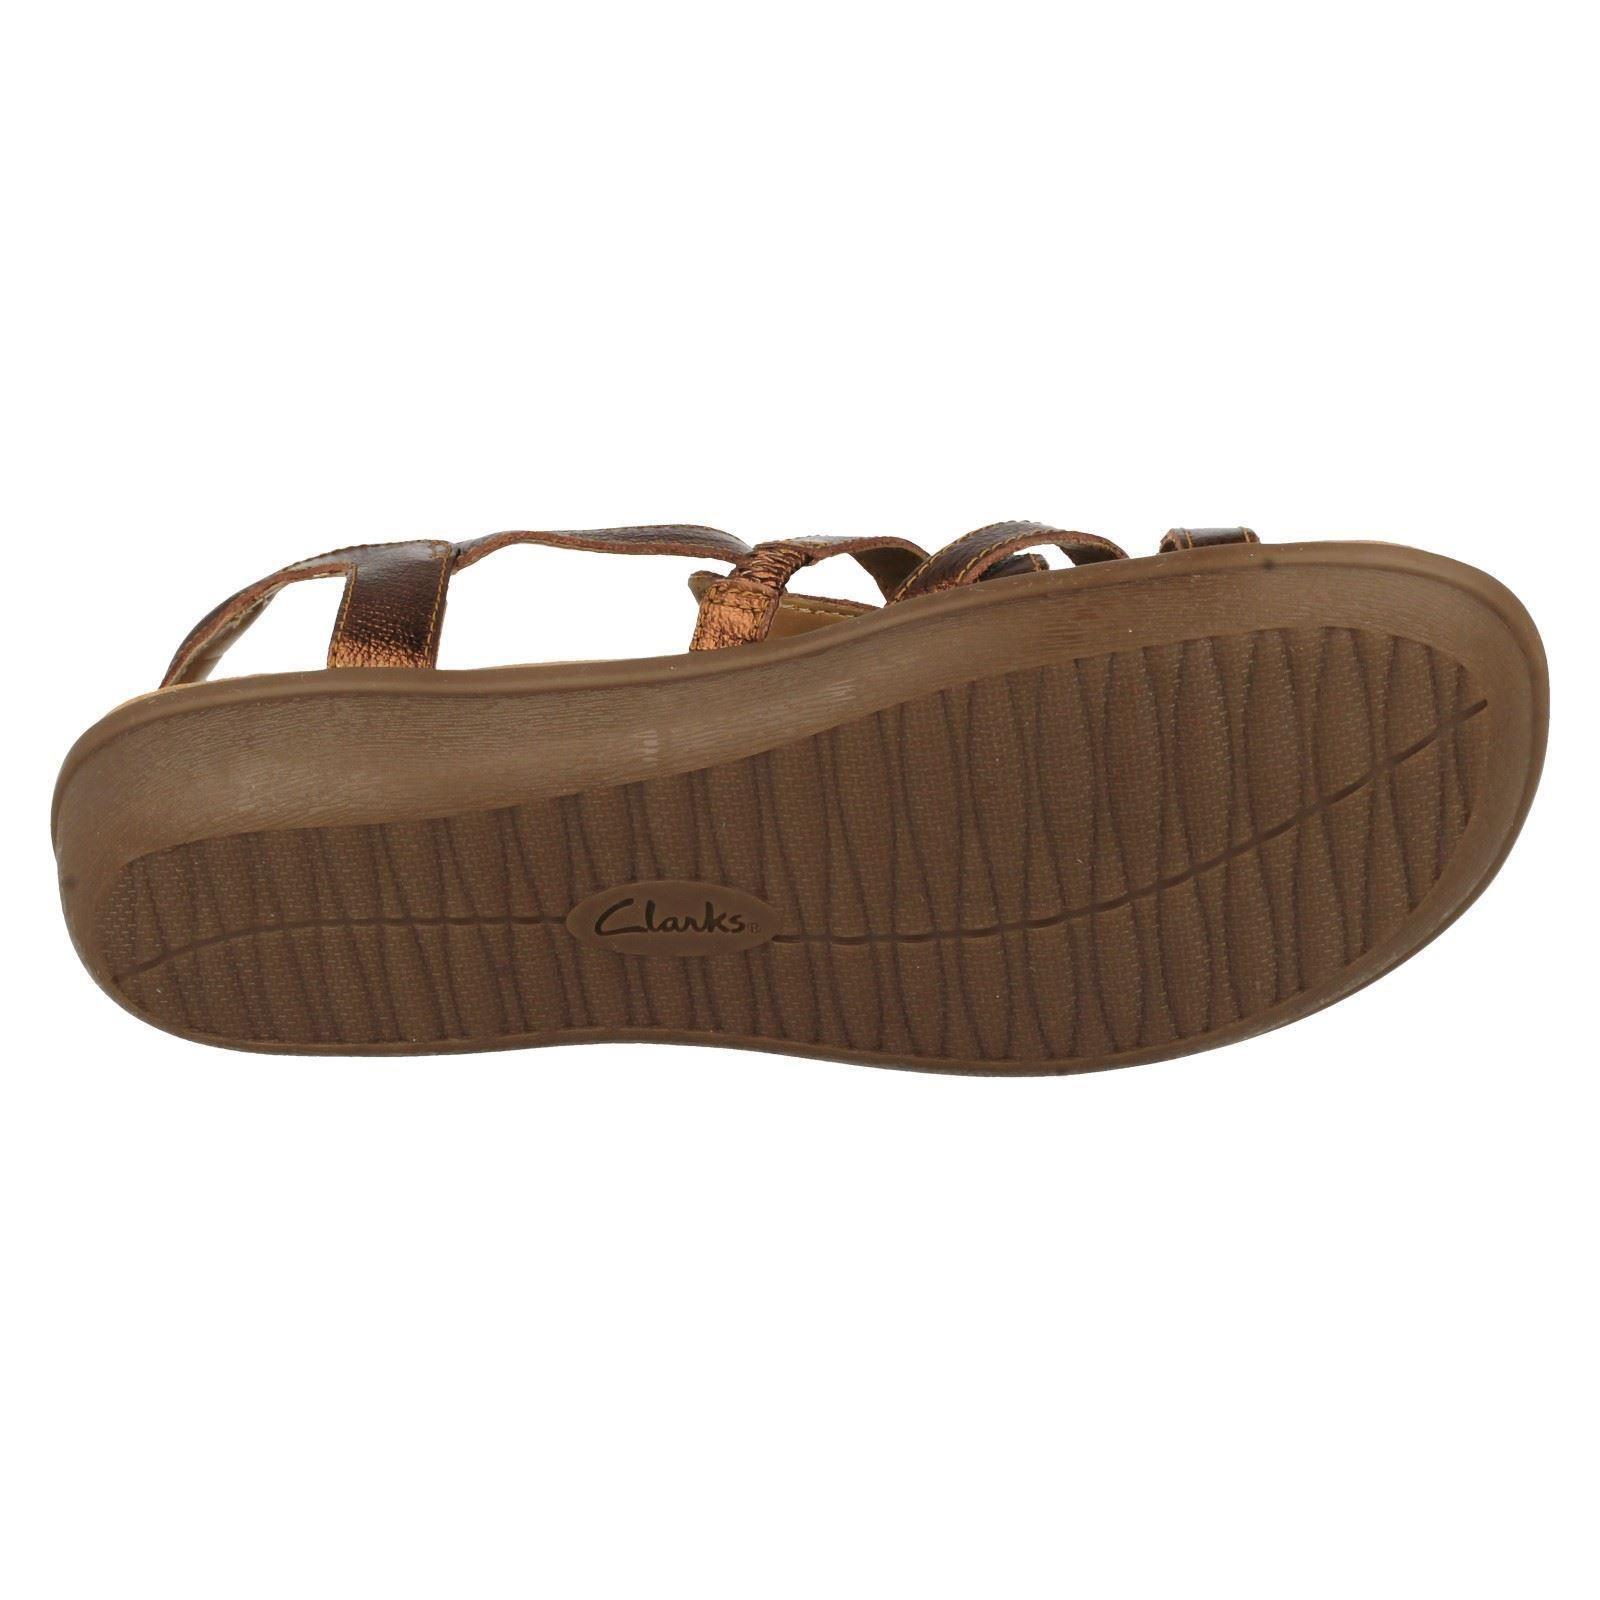 1a62e2fa58a Womens-Clarks-Gladiator-Style-Sandals-Manilla-Bonita thumbnail 16